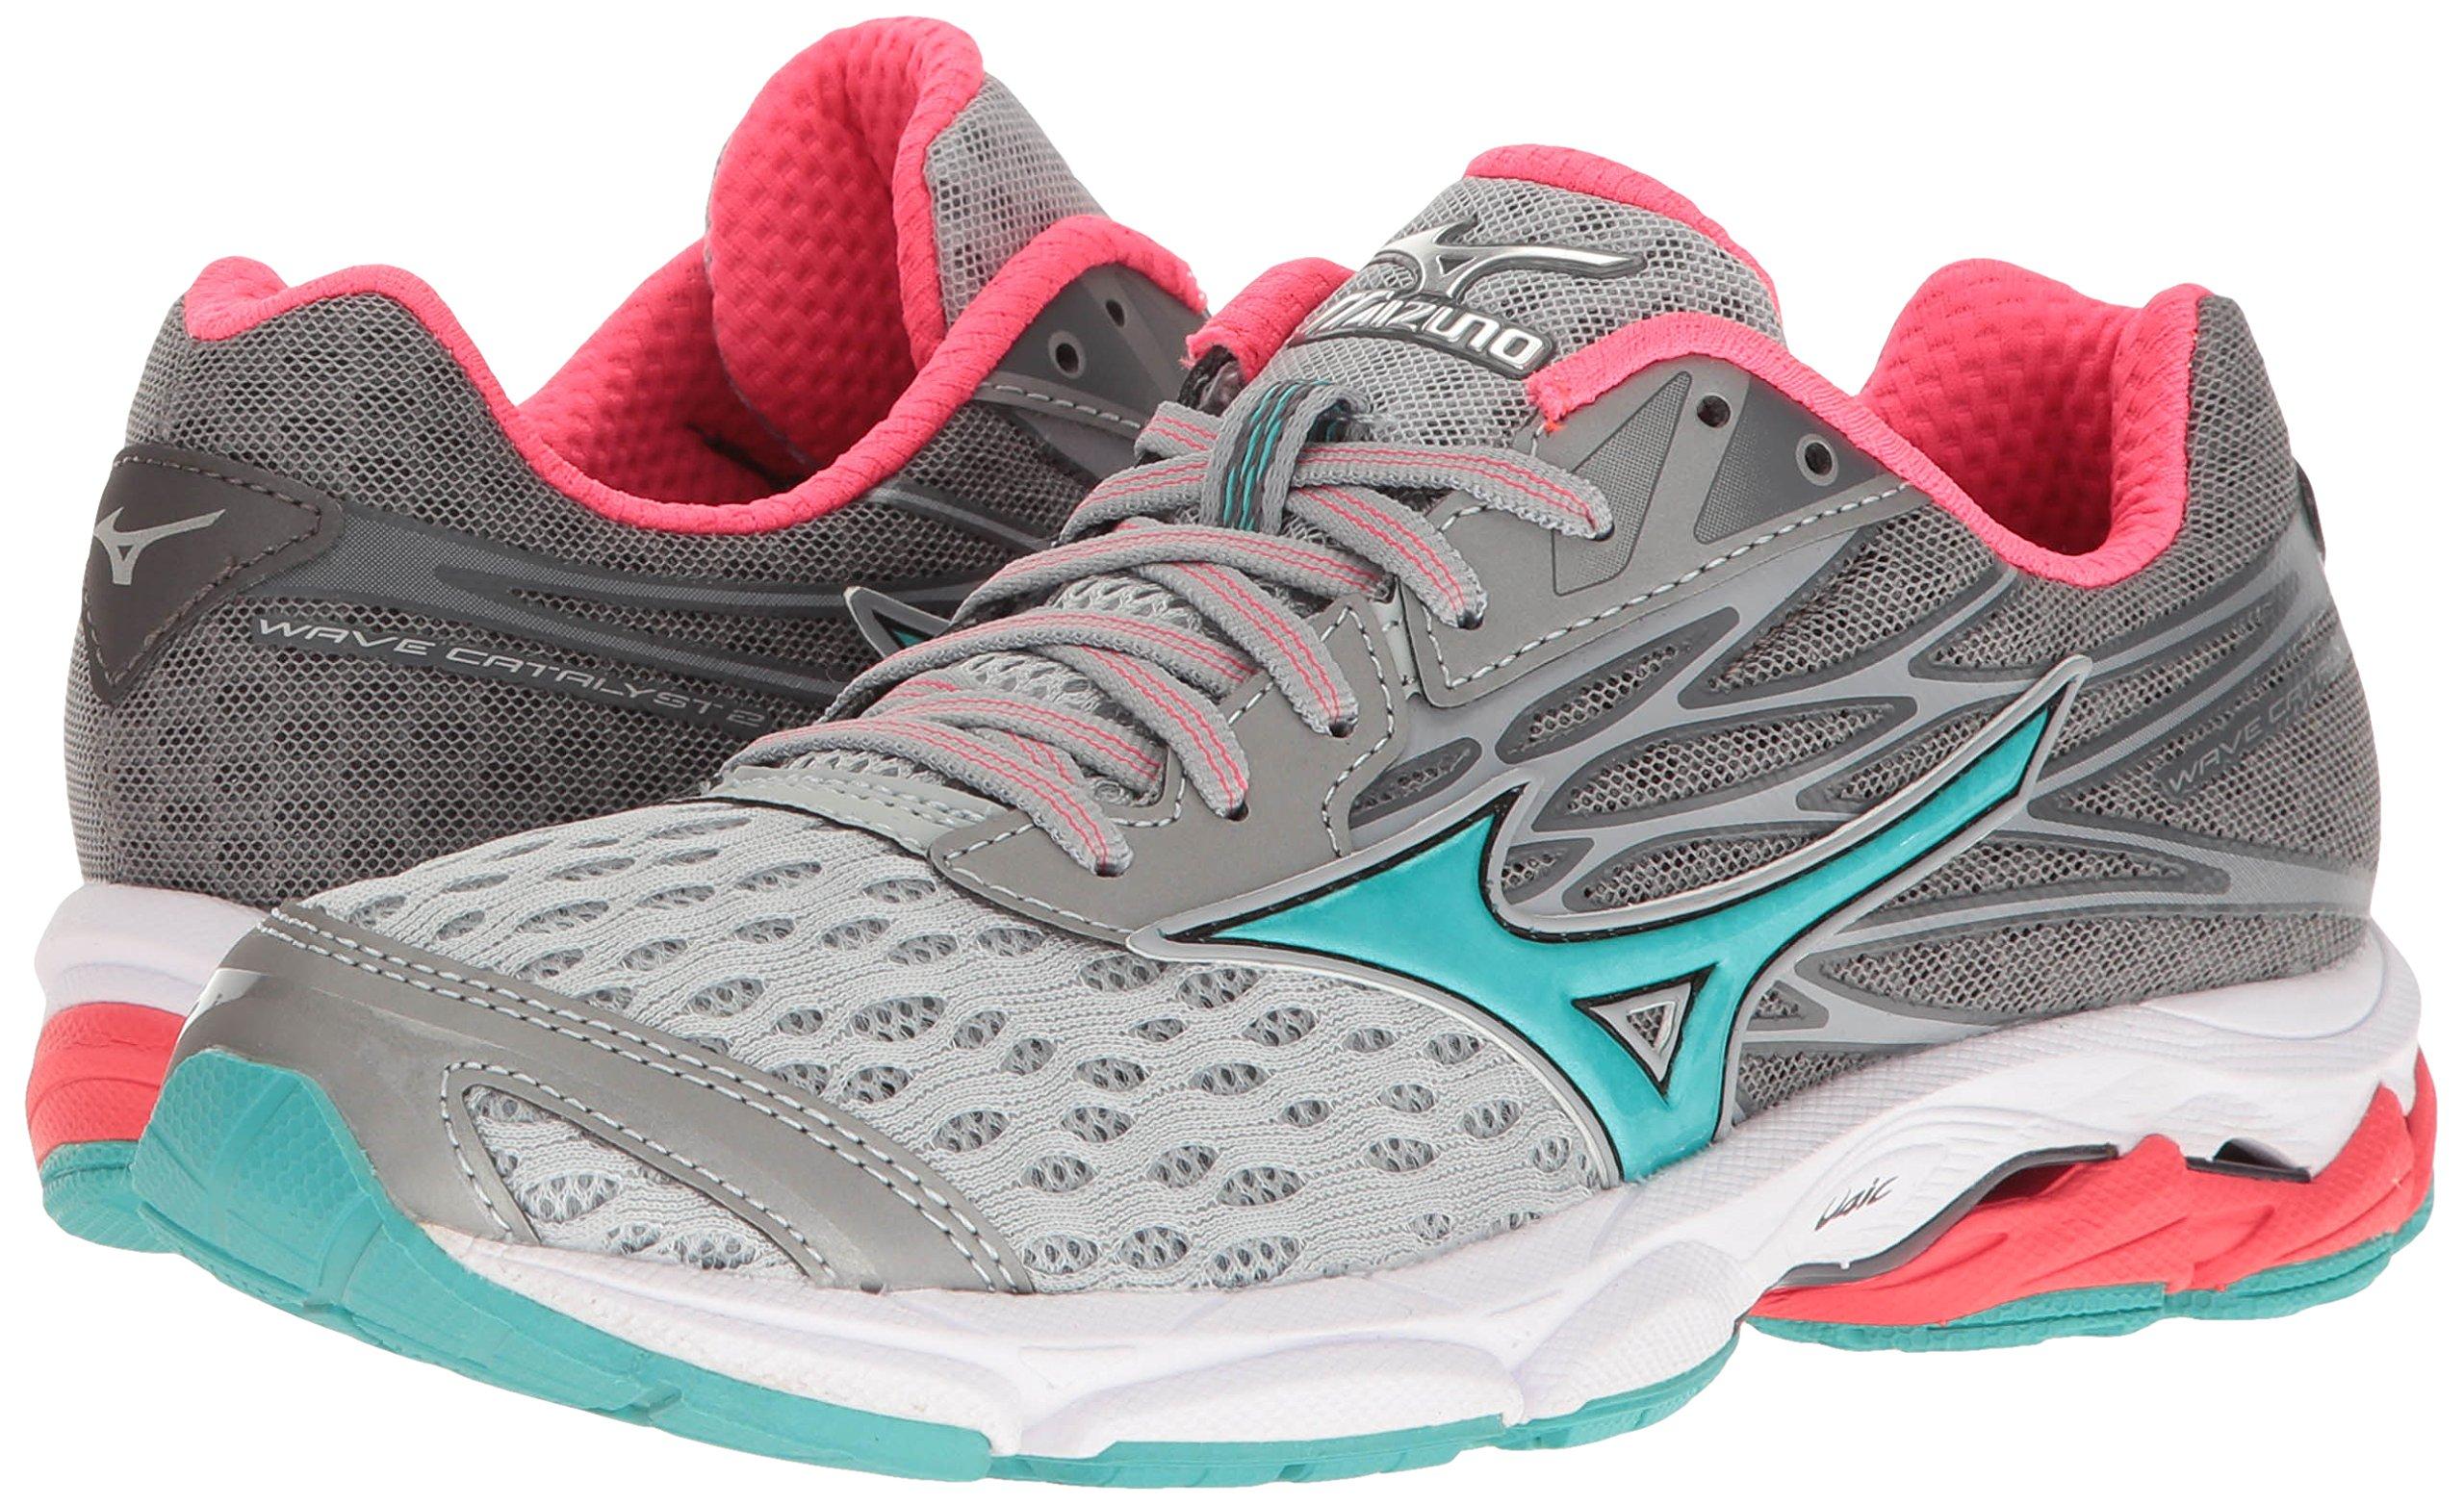 Mizuno Women's Wave Catalyst 2 Running Shoe, Grey/Mint, 9 B US by Mizuno (Image #6)